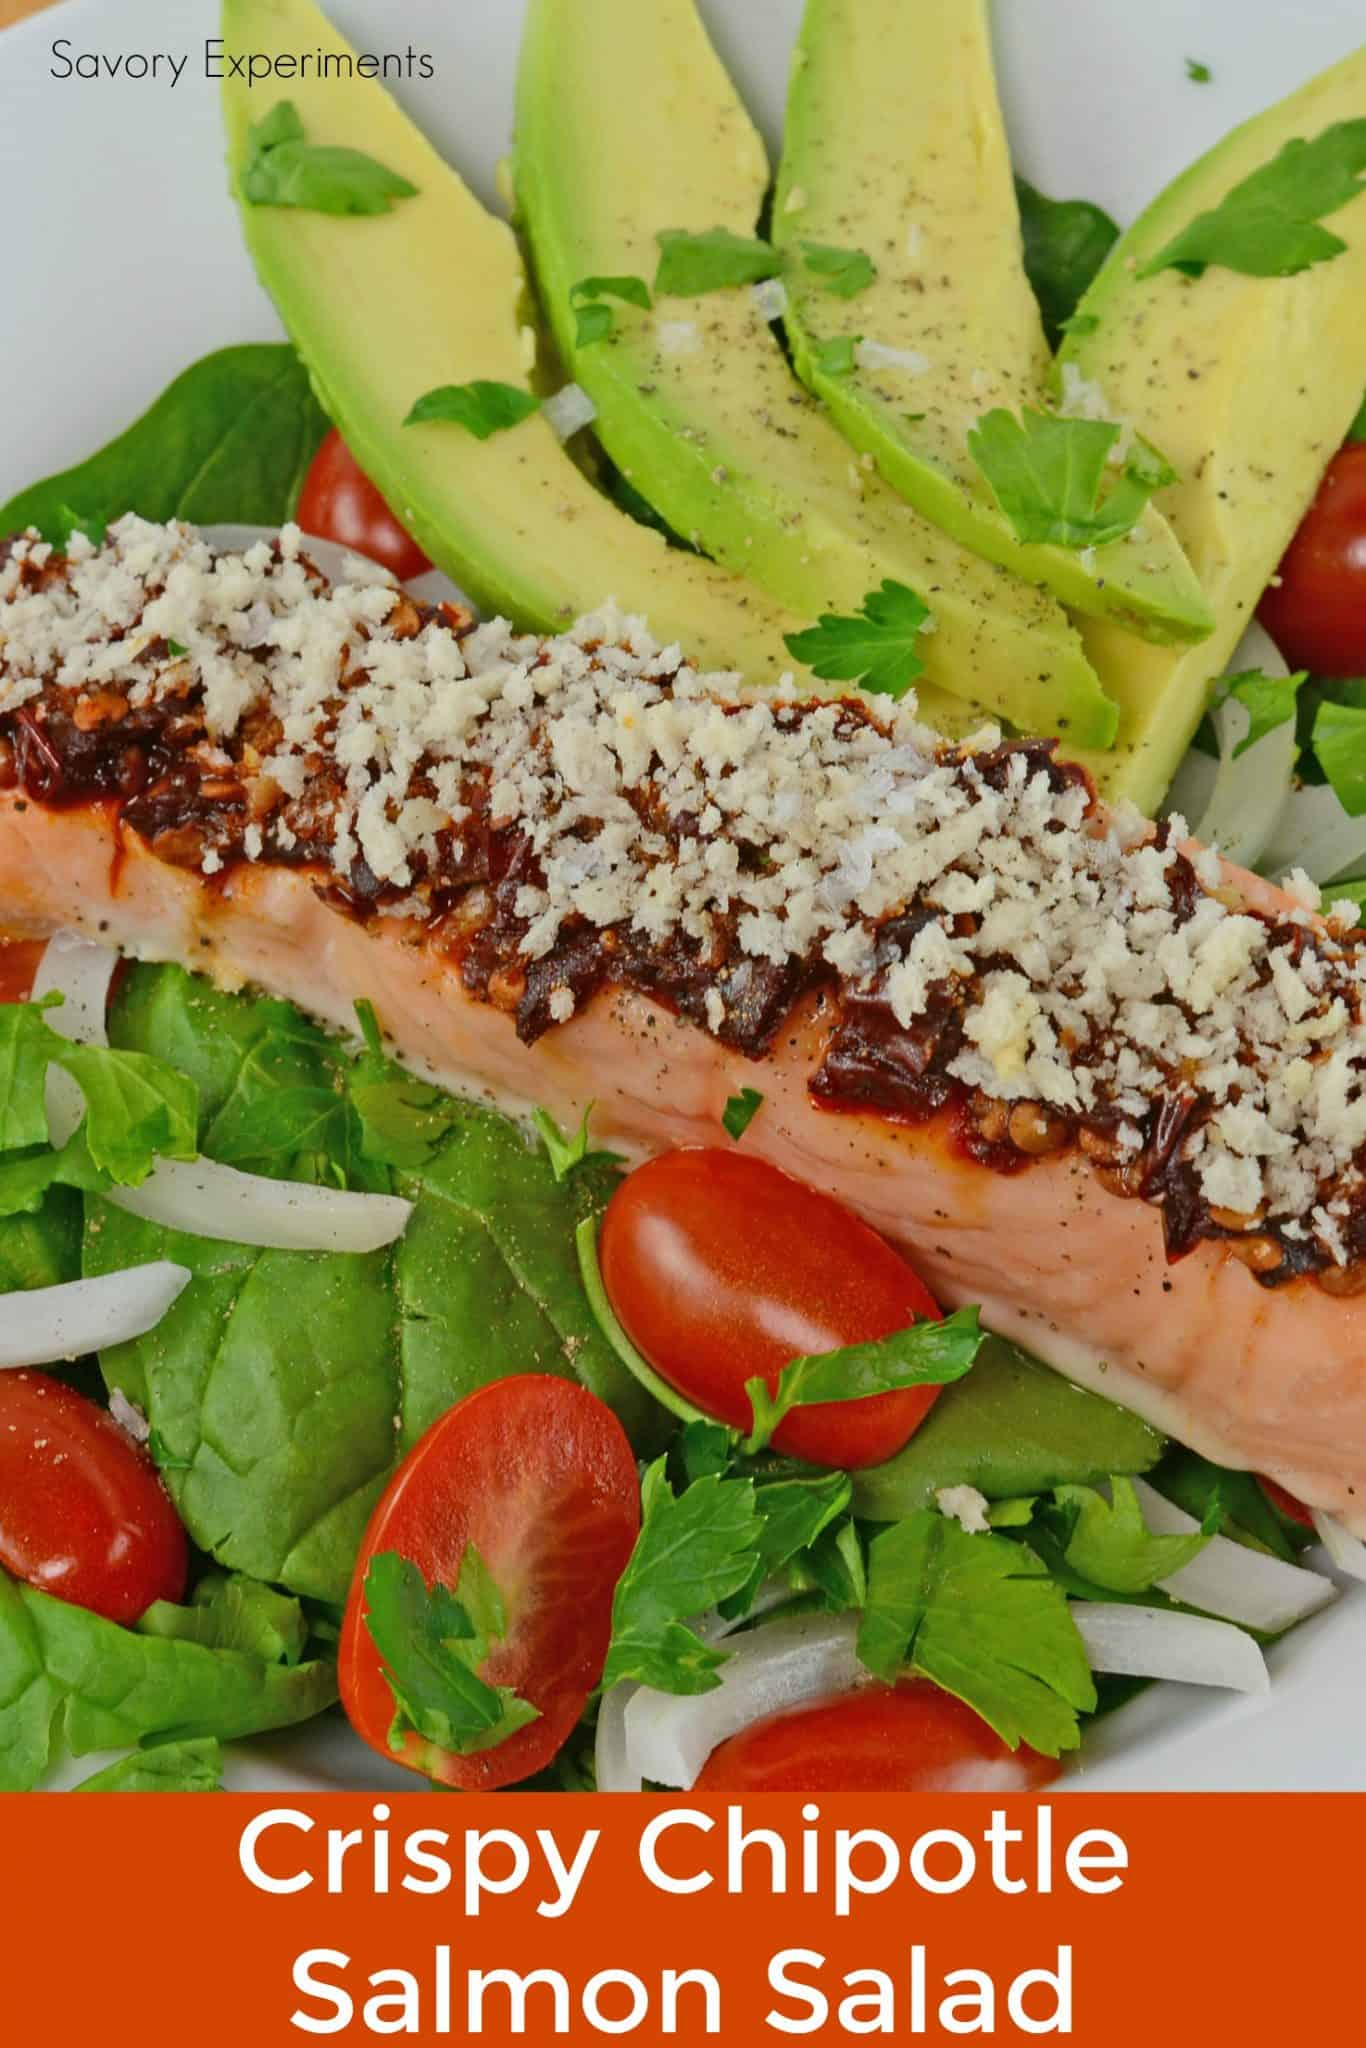 enjoy your crispy chipotle salmon salad with cilantro lime dressing